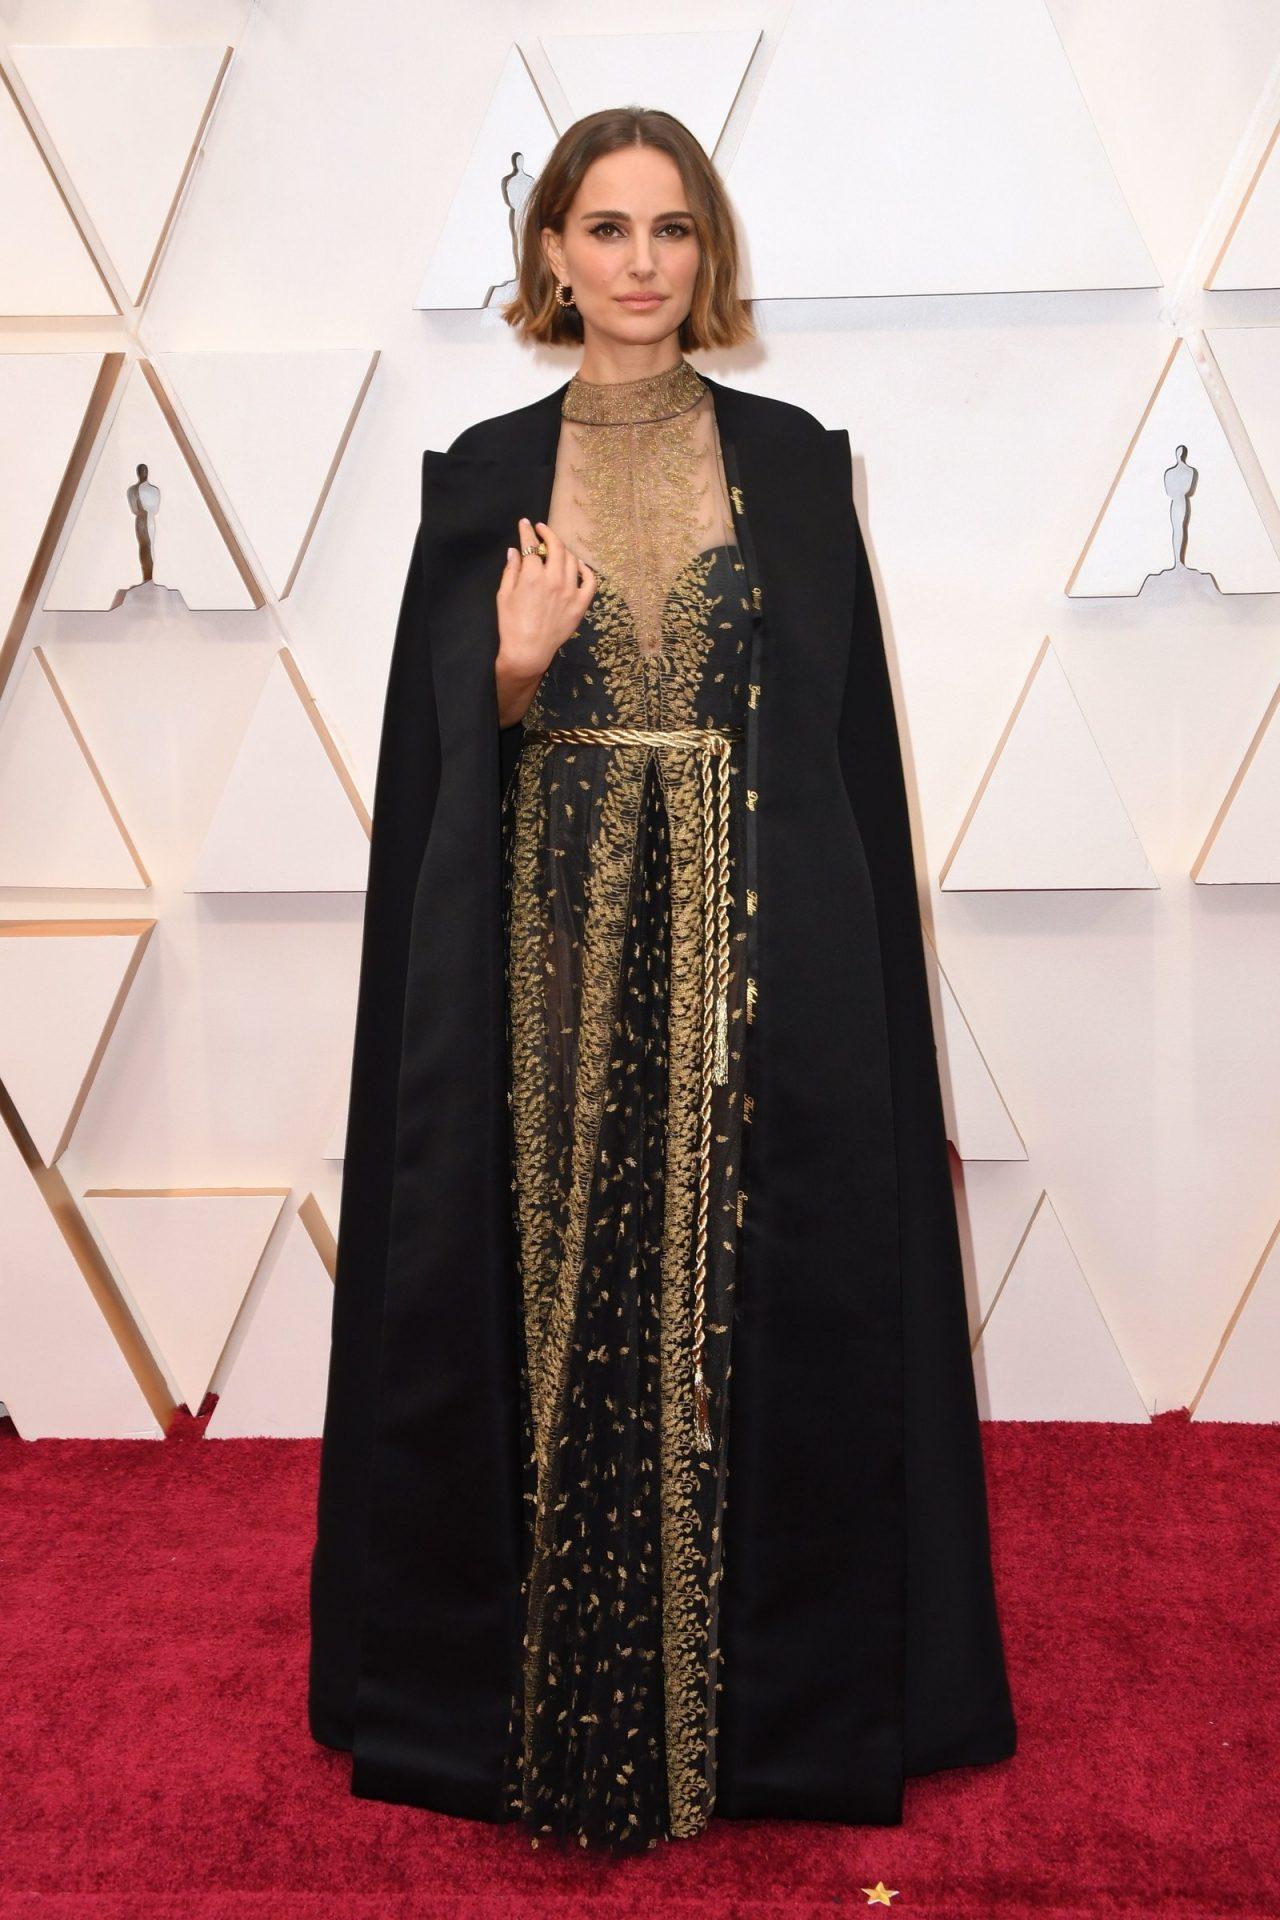 Natalie Portman in Dior 2020 Oscar